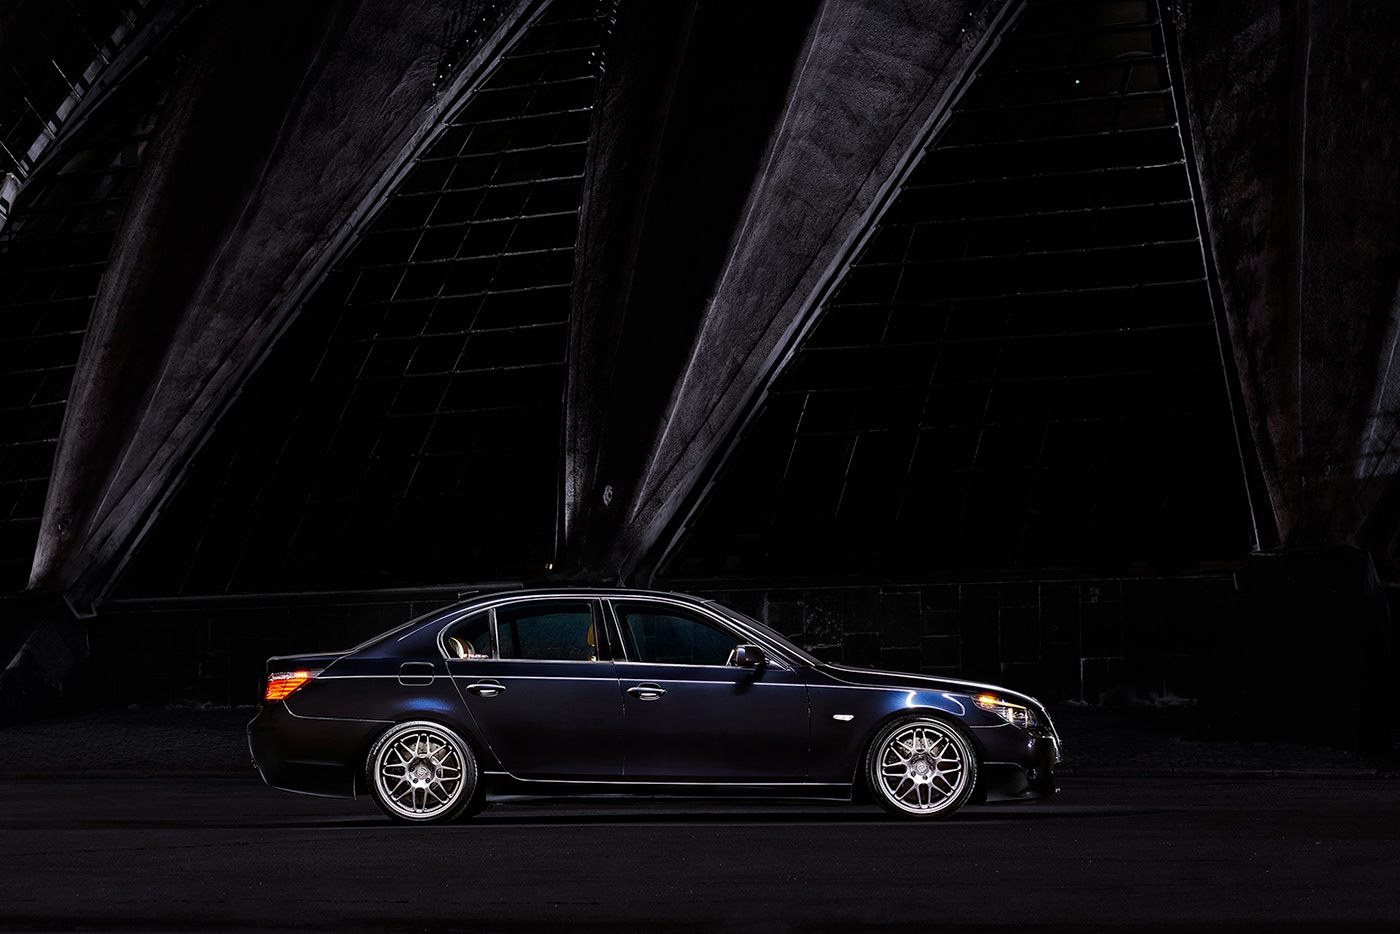 dmitry zhuravlev Photography  automotive   BMW e60